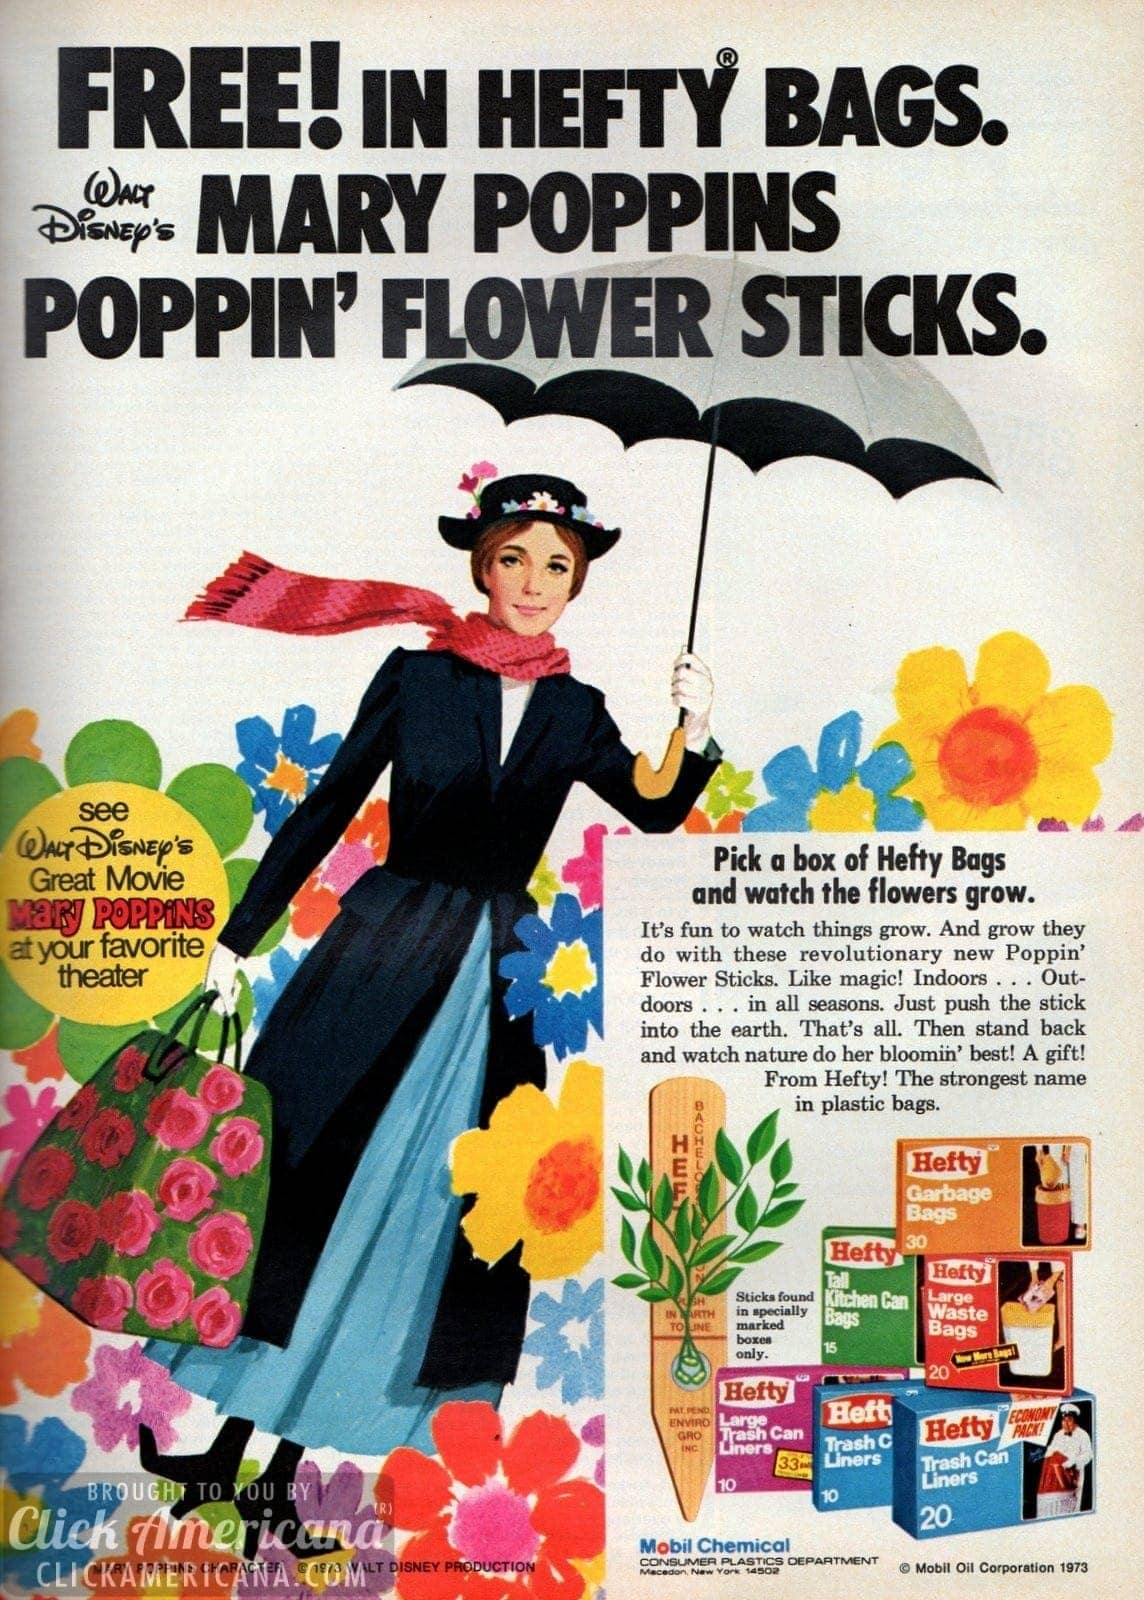 Walt Disneys Mary Poppins Poppin Flower Sticks 1973